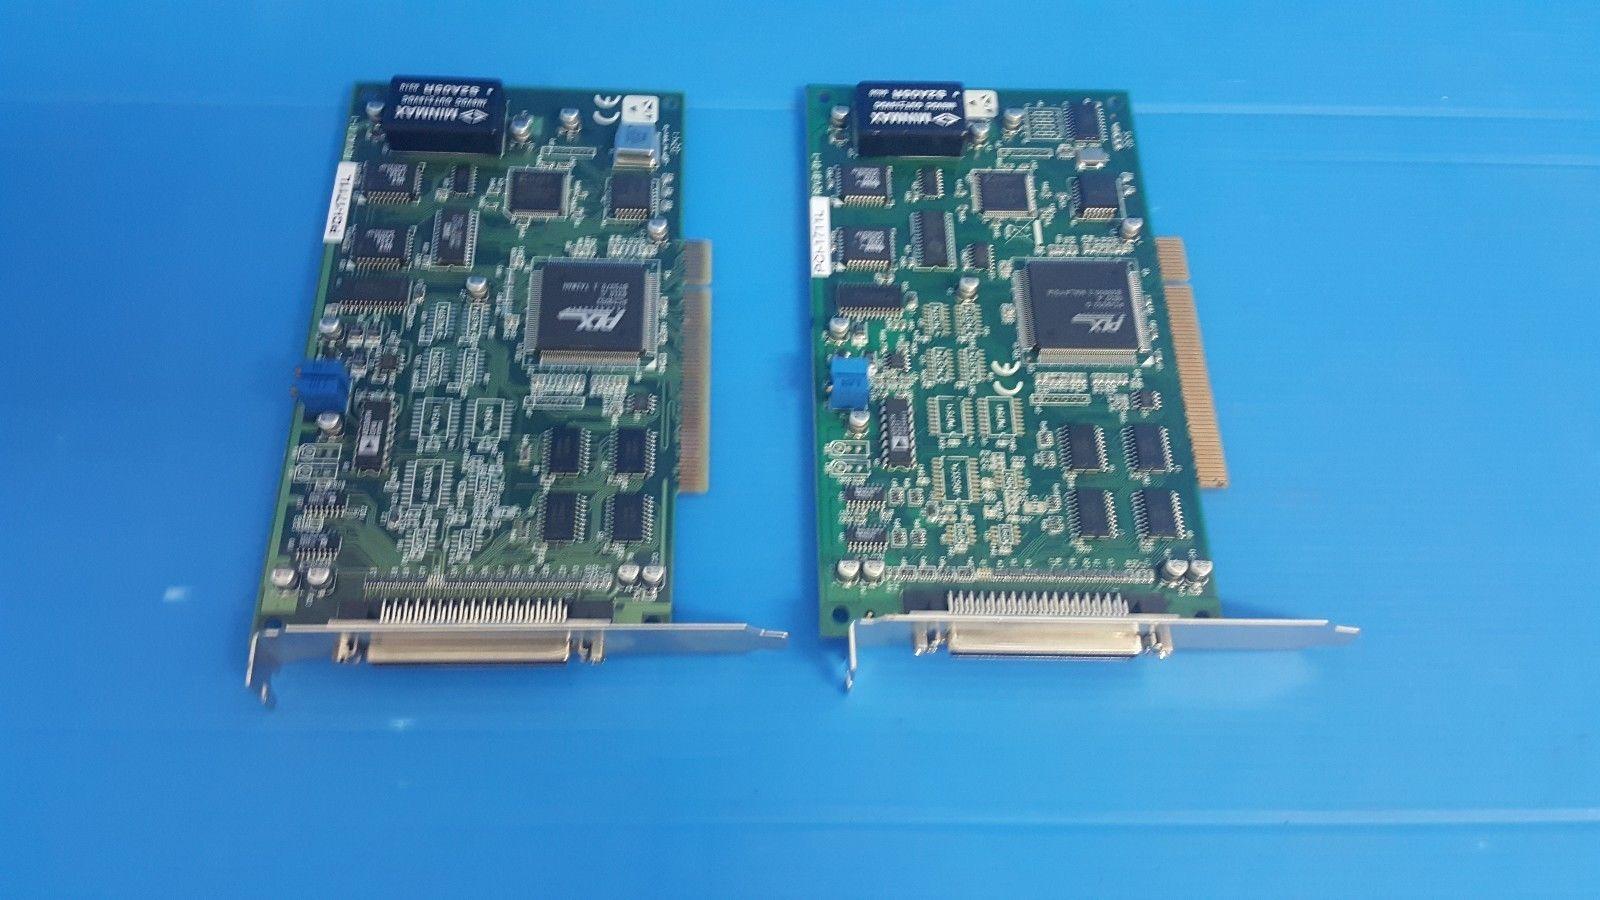 PCI-1711L REV A2 01-1 multi-function data acquisition card spot